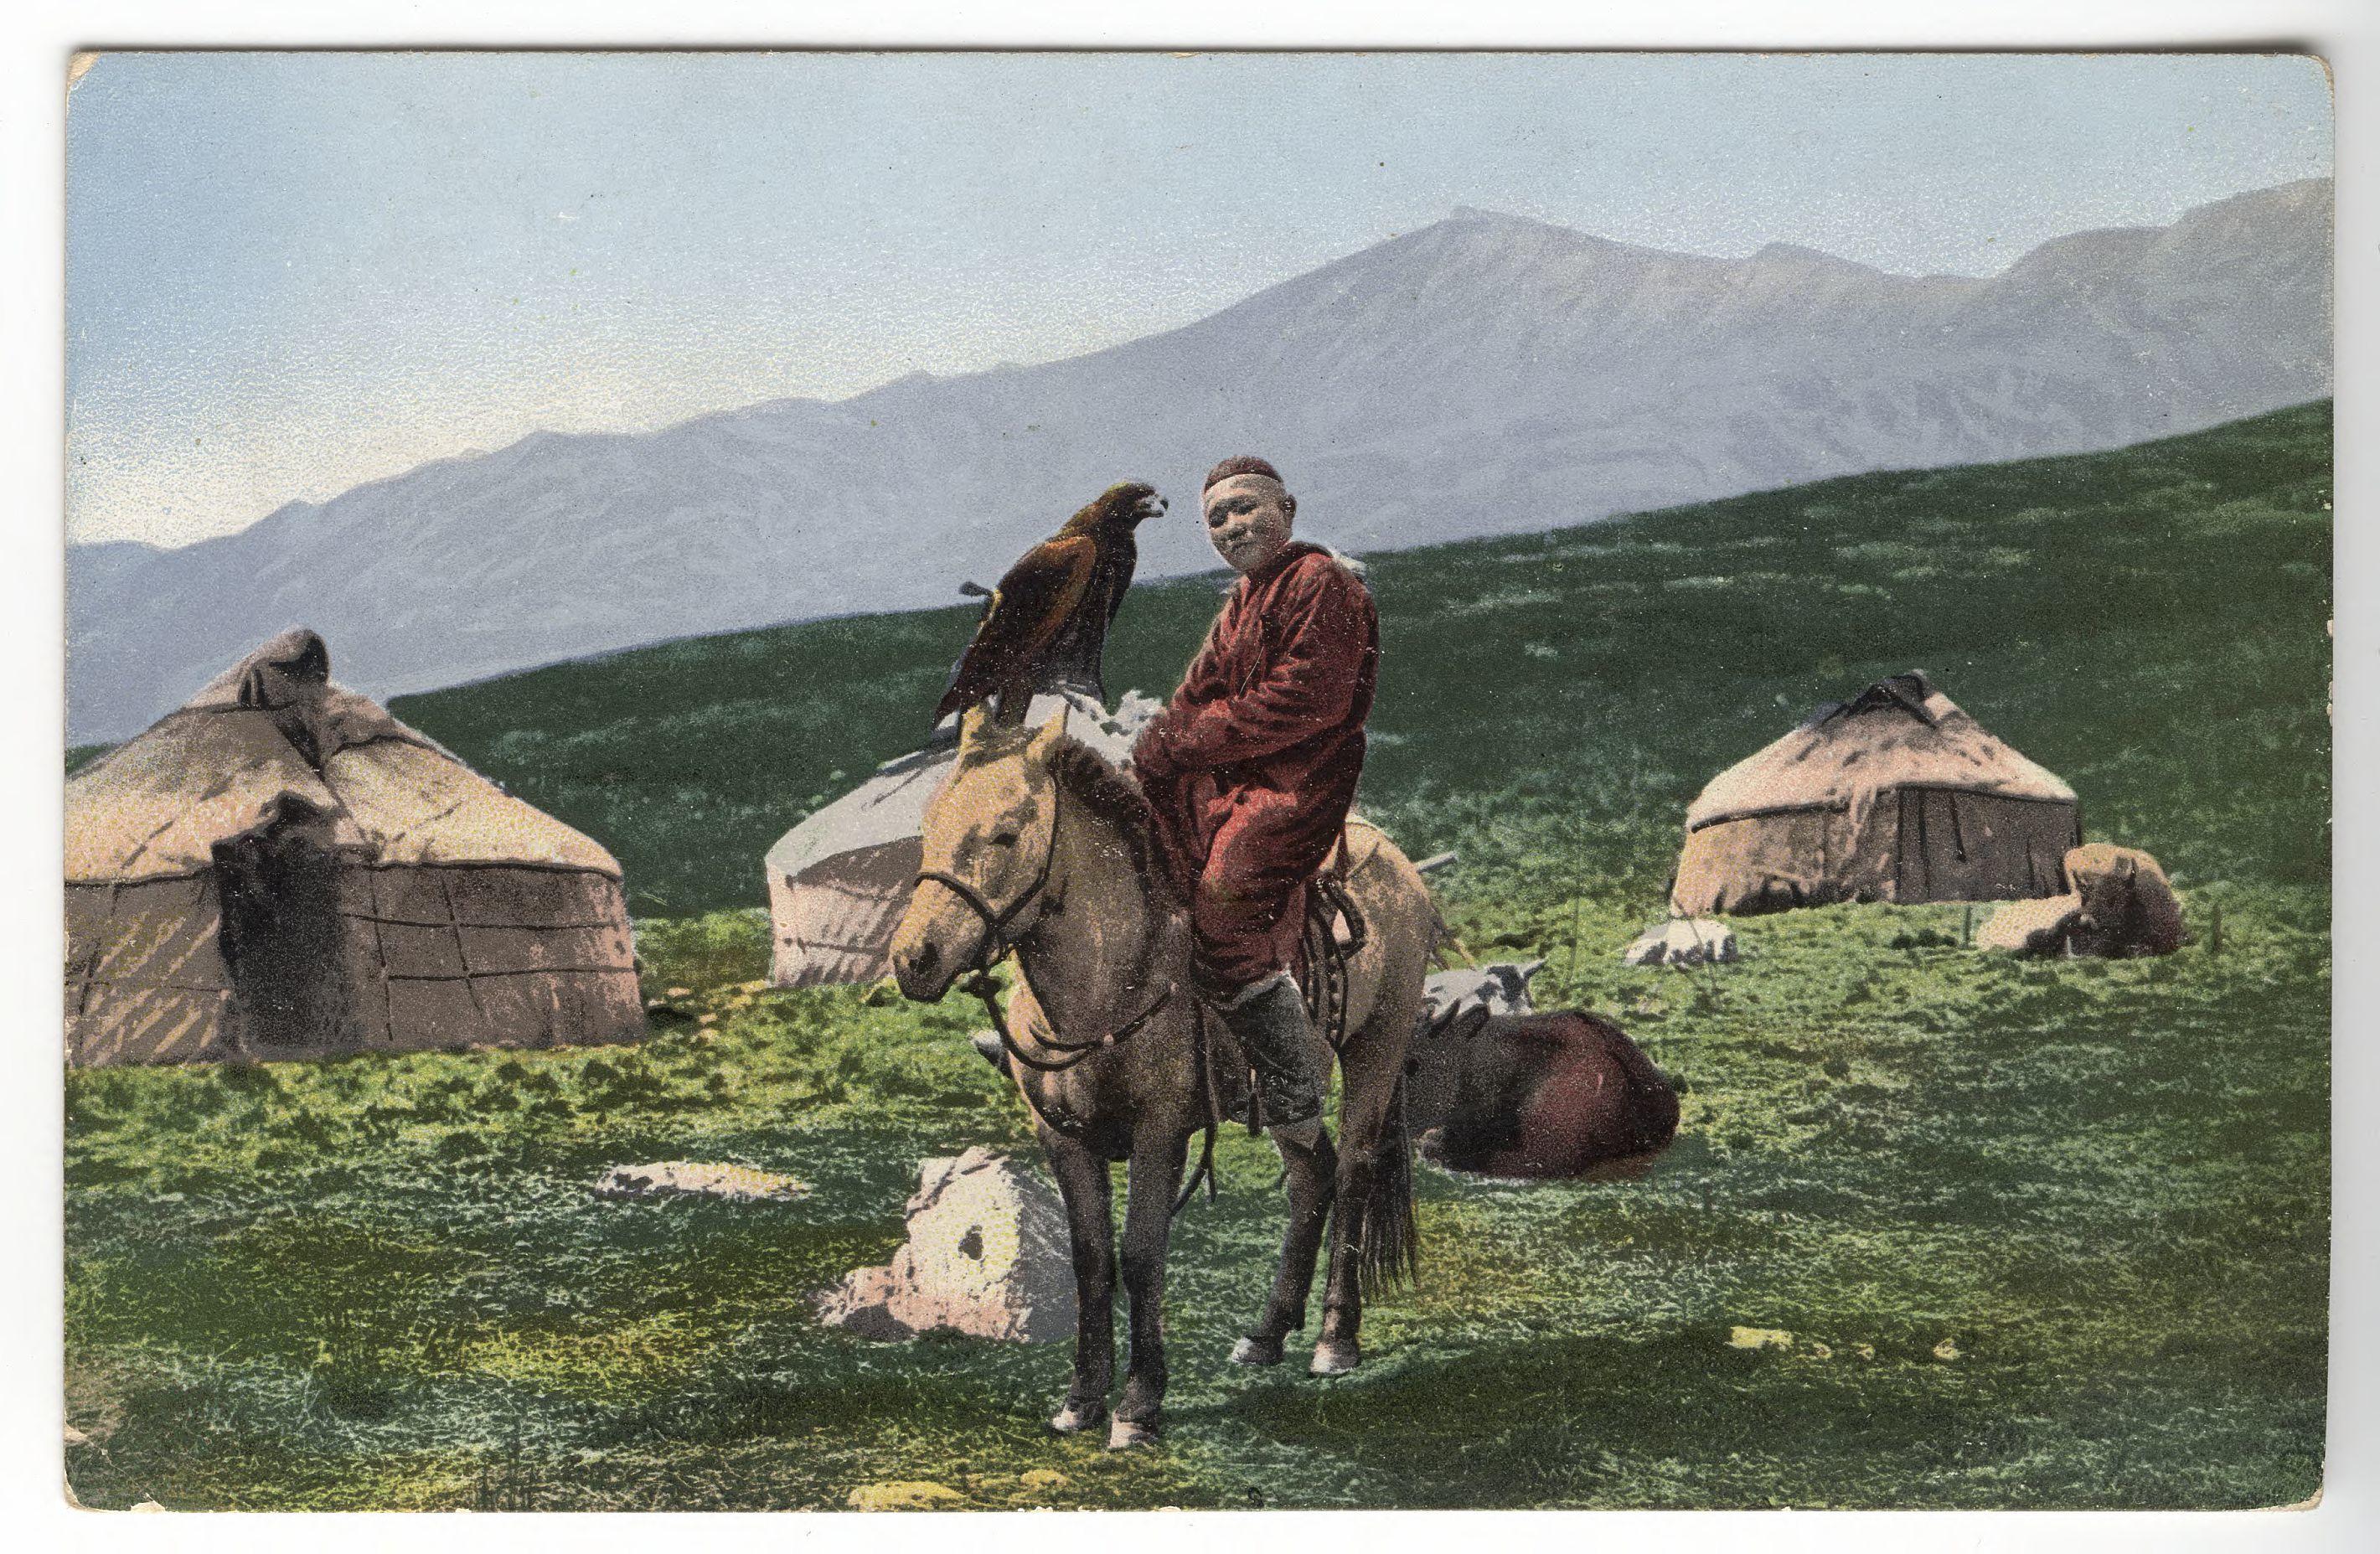 SB - Kazakh man on horse with golden eagle.jpg